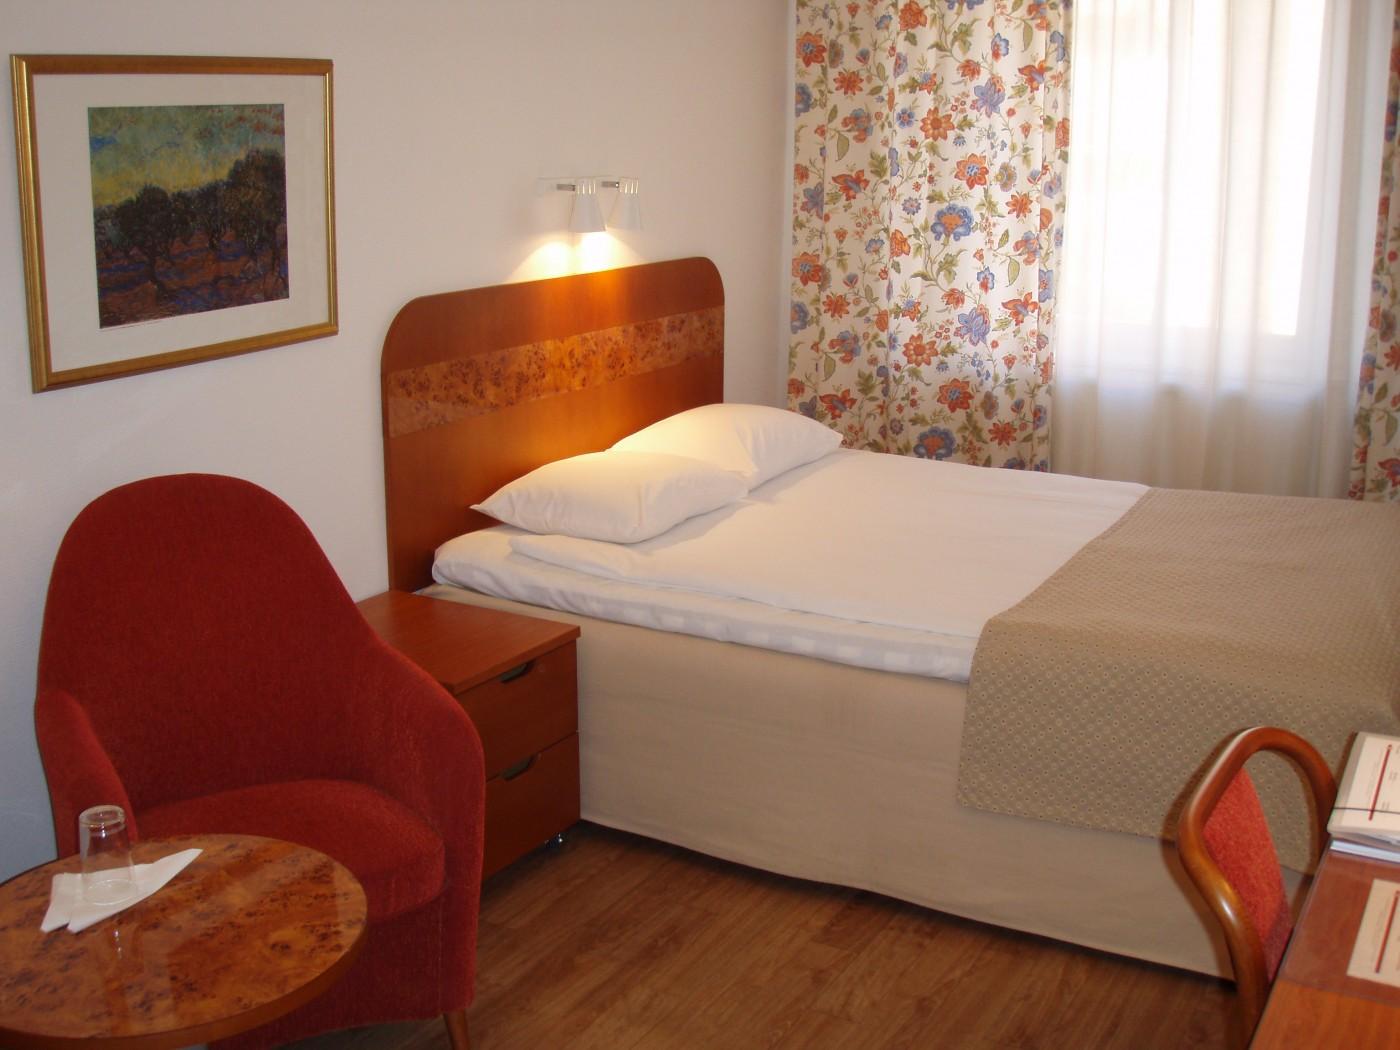 Dubbelrum grandlit 140 cm bred säng